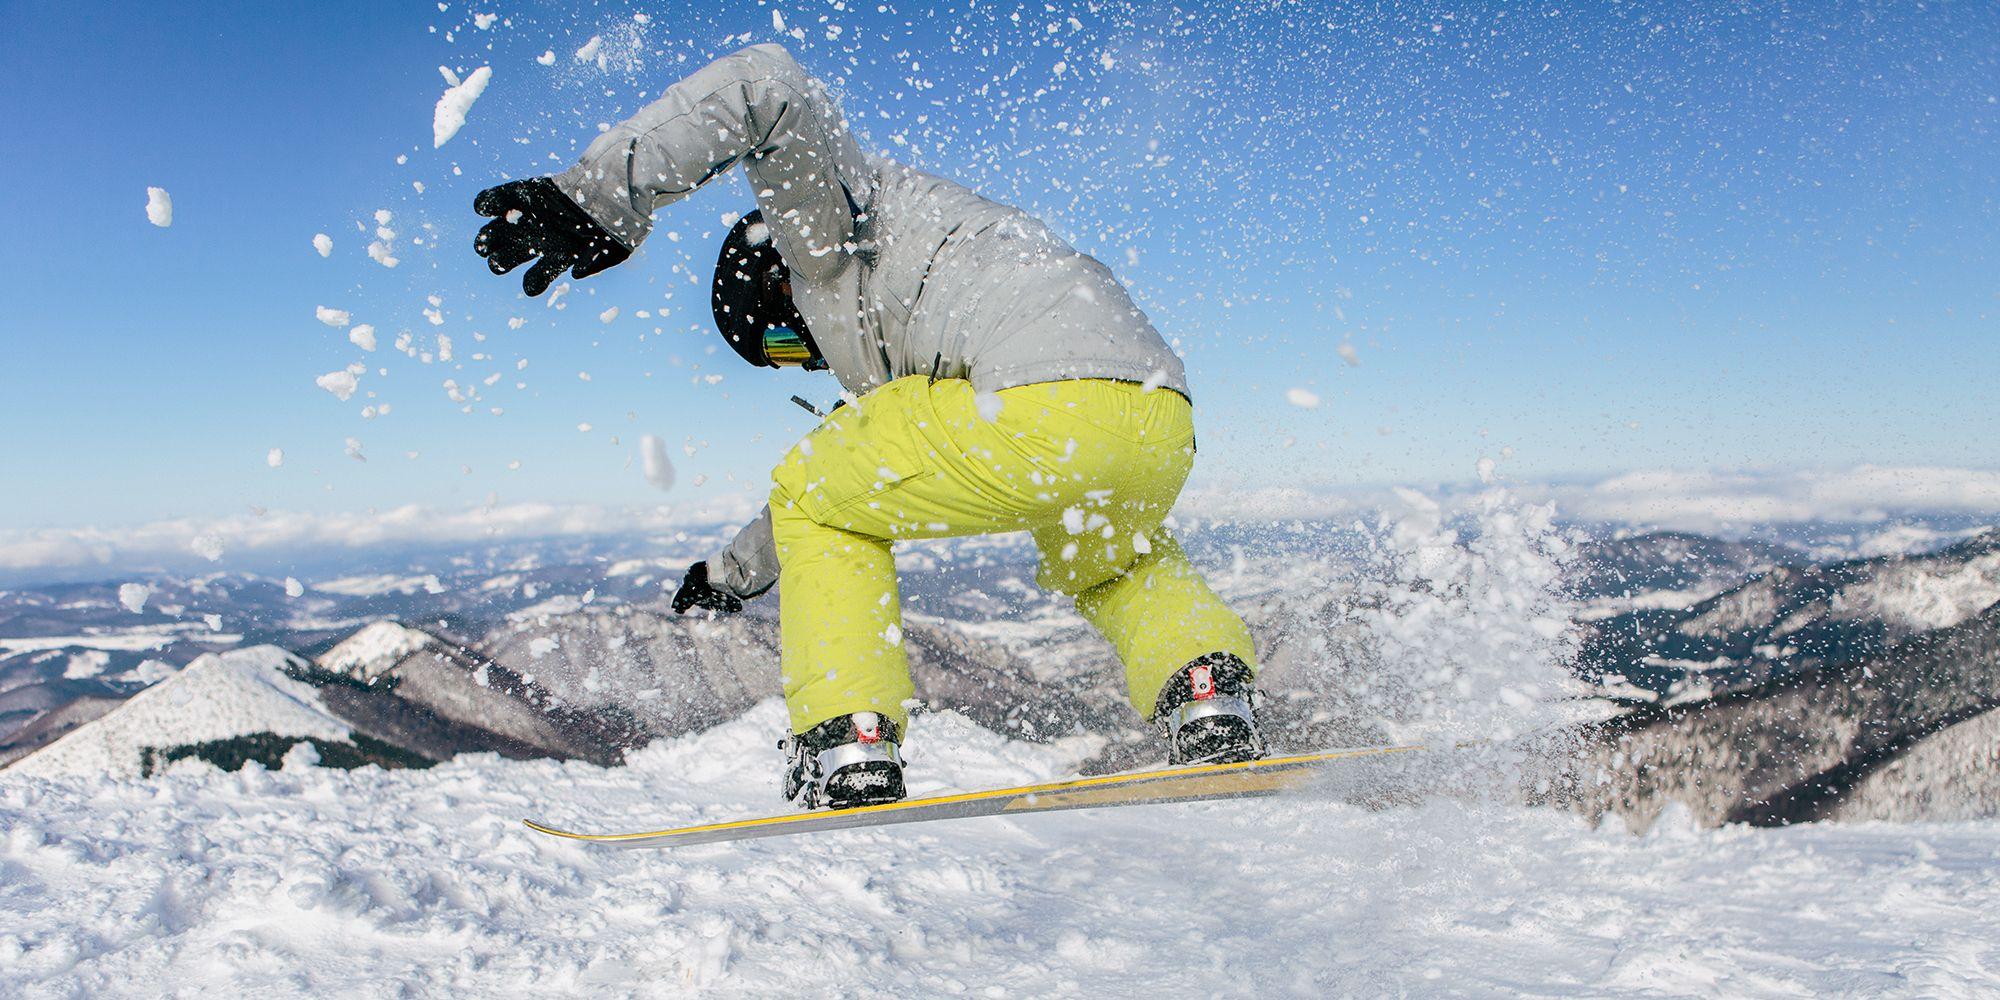 9 Best Ski & Snowboard Waxes for 2020 - Ski & Snowboard Waxing Kits